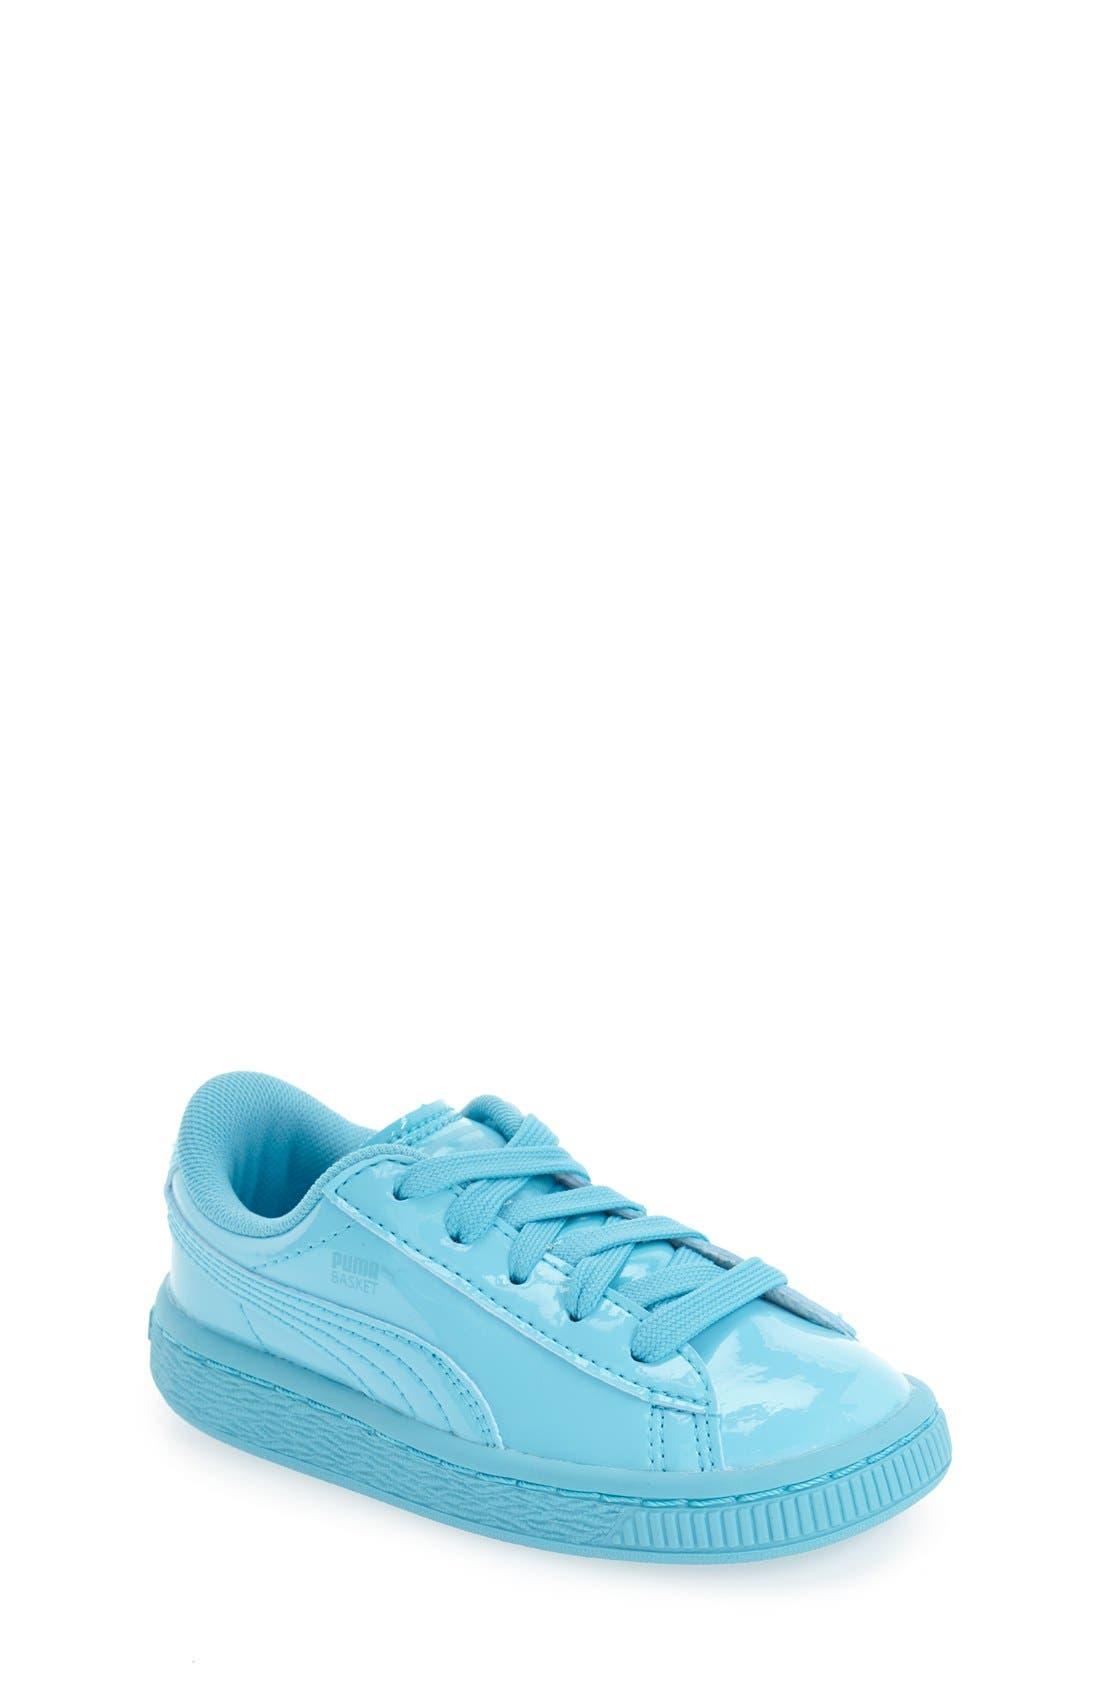 'Basket Classic' Shoe,                             Main thumbnail 1, color,                             Blue Atoll-Blue Atoll